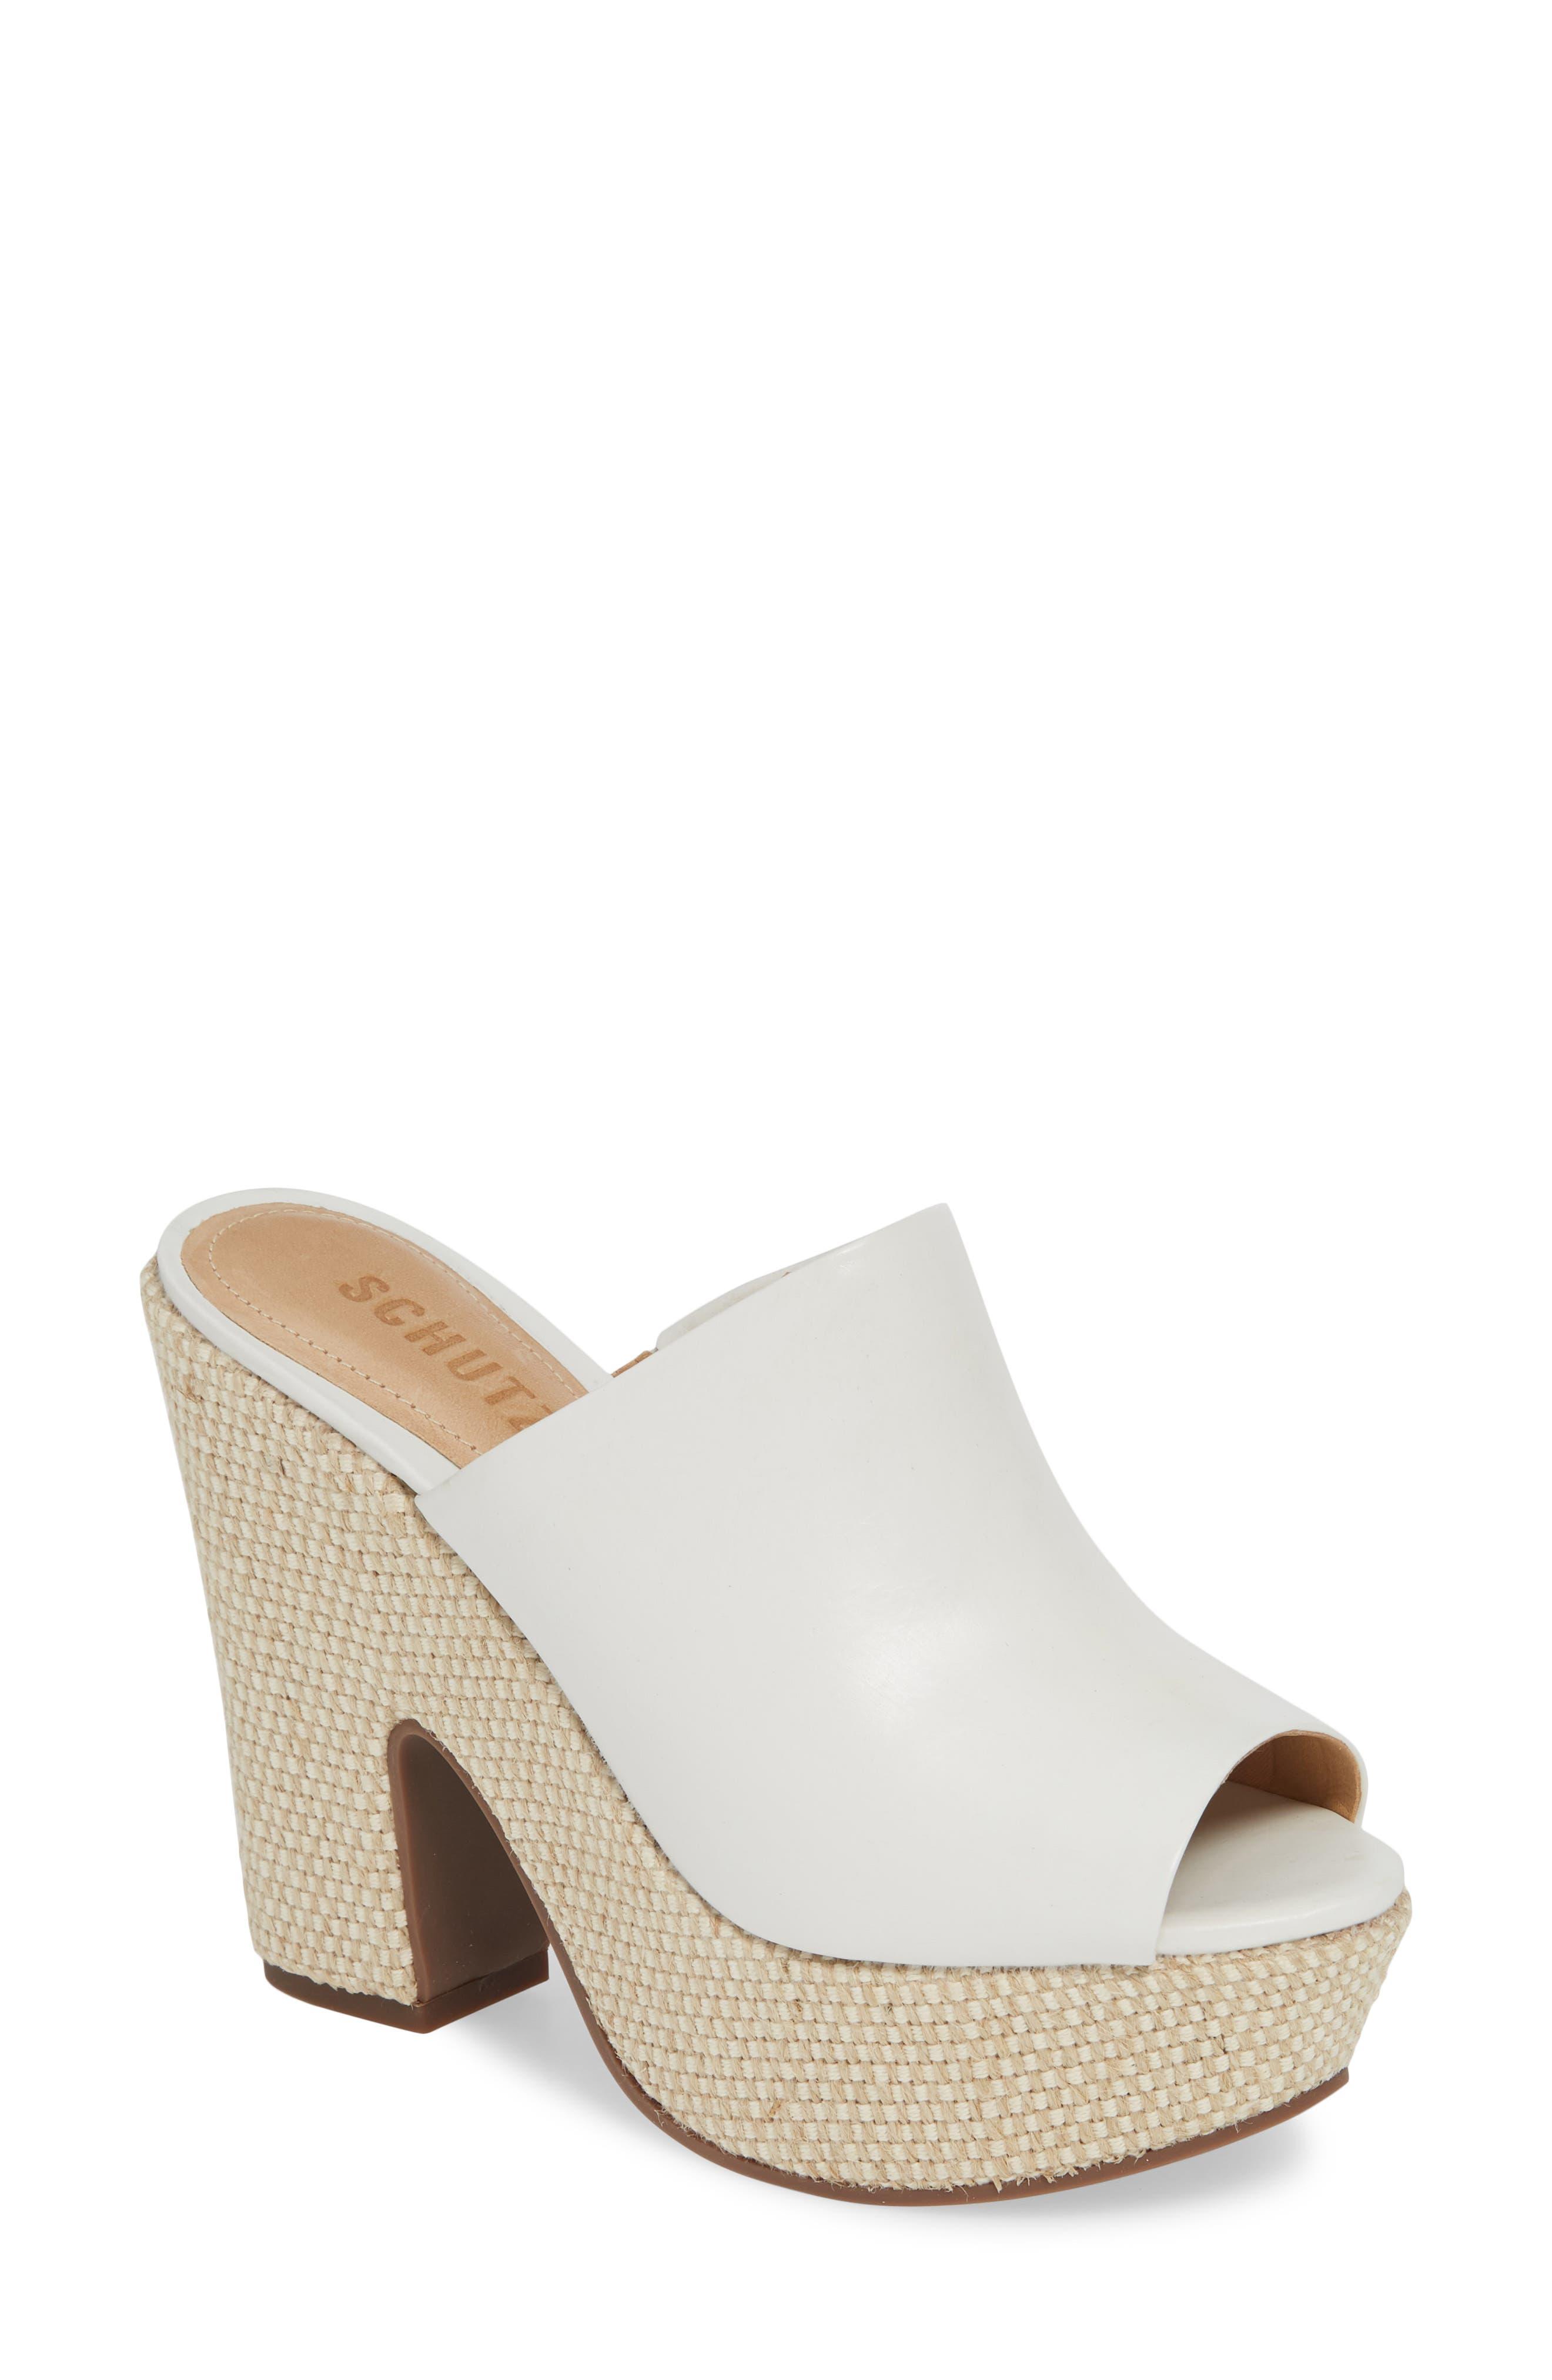 Schutz Dandara Platform Slide Sandal- White